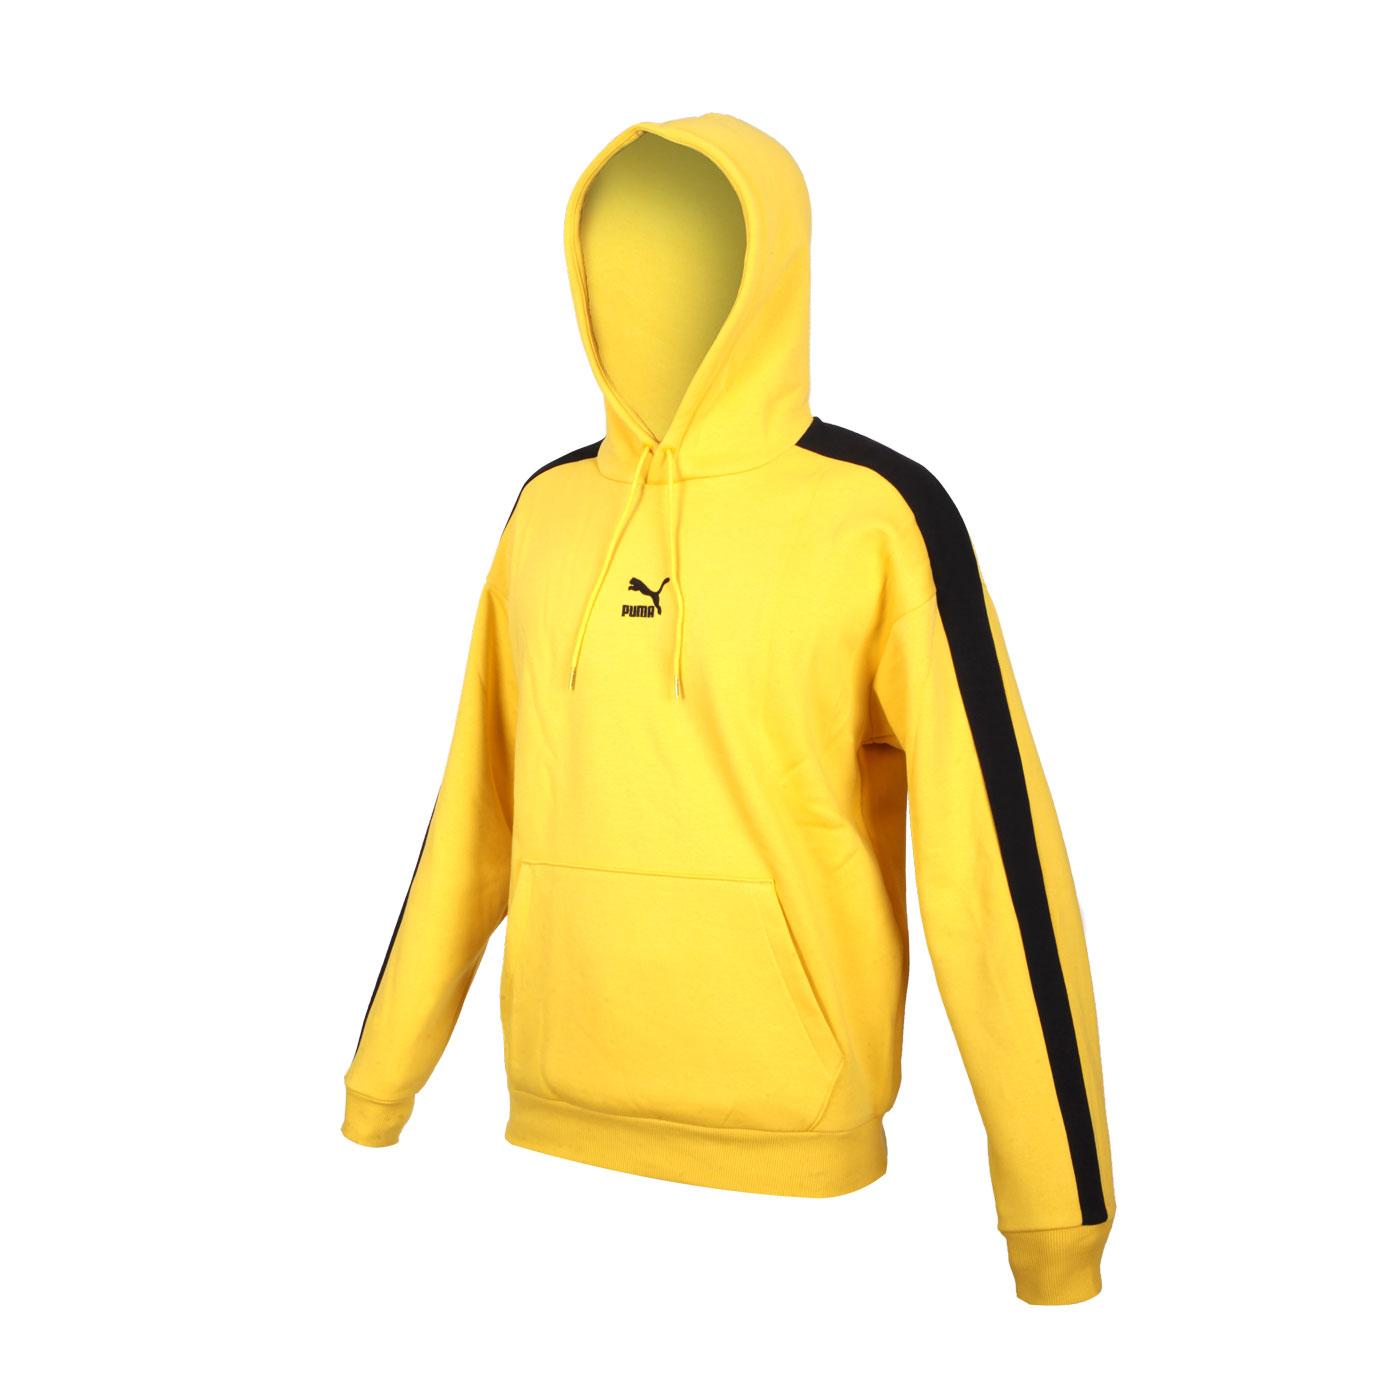 PUMA 男款寬版T7長厚連帽T恤 53027299 - 黃黑